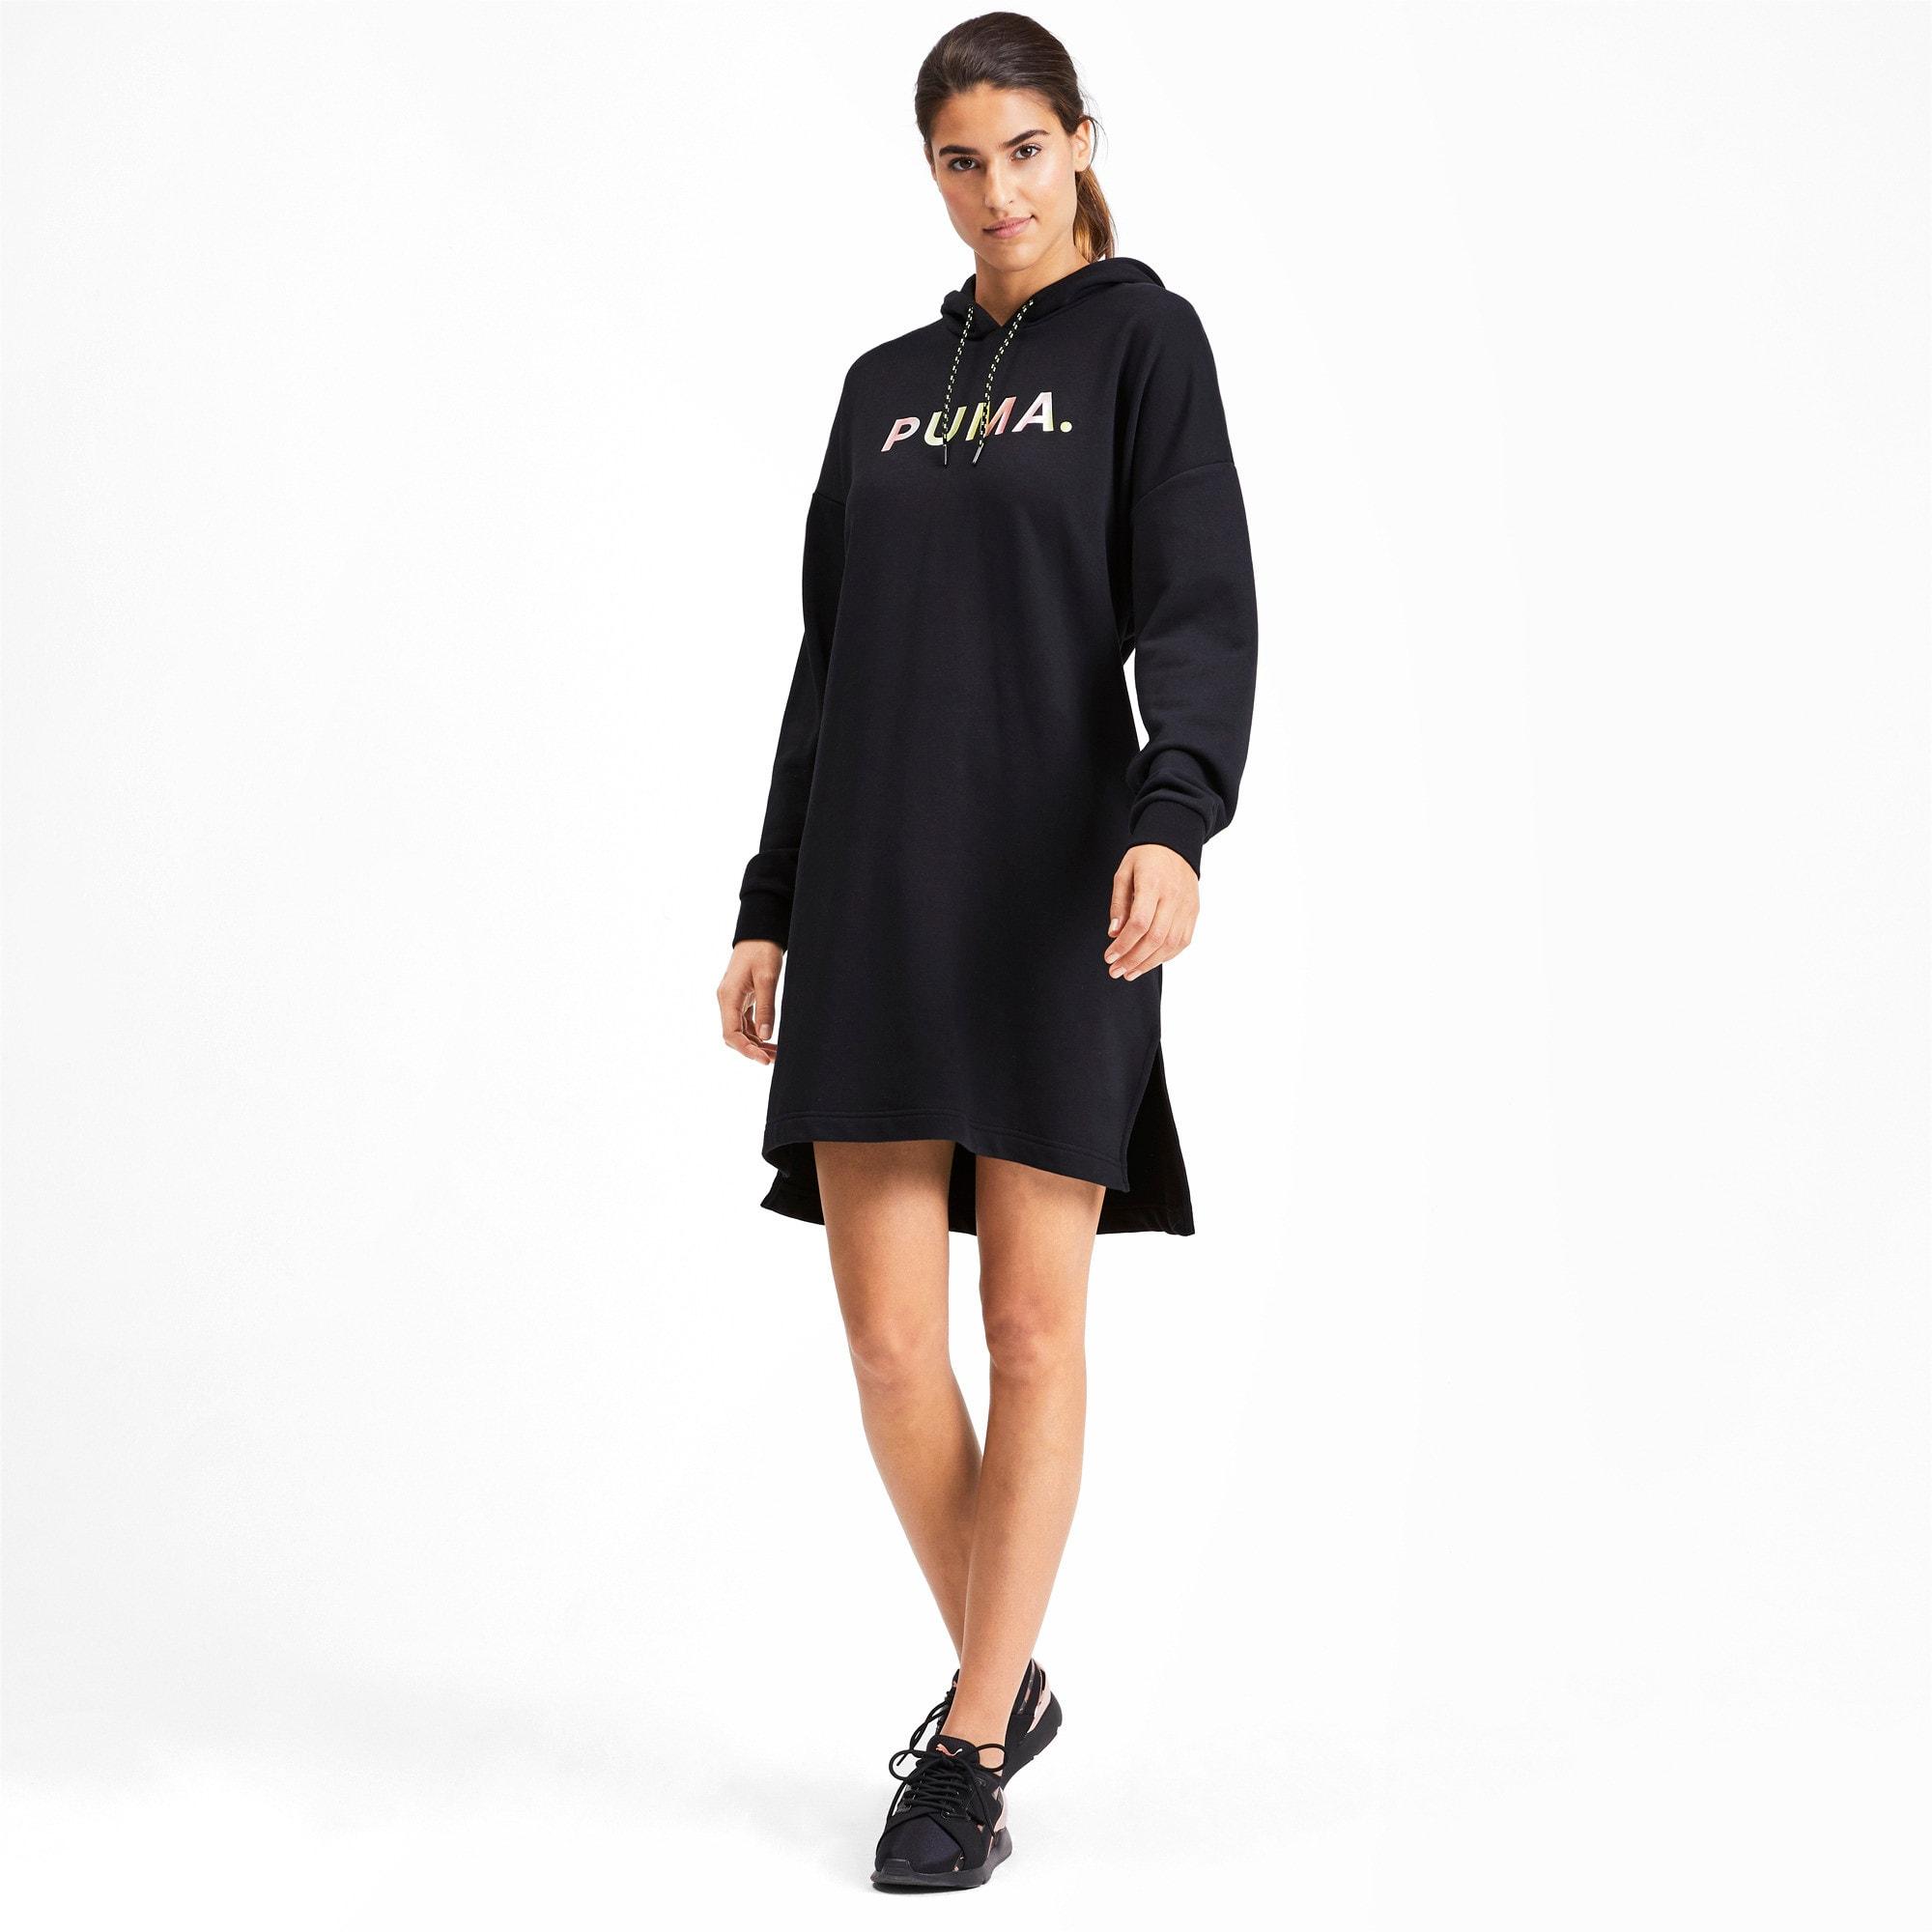 Thumbnail 3 of Chase Women's Hooded Dress, Puma Black, medium